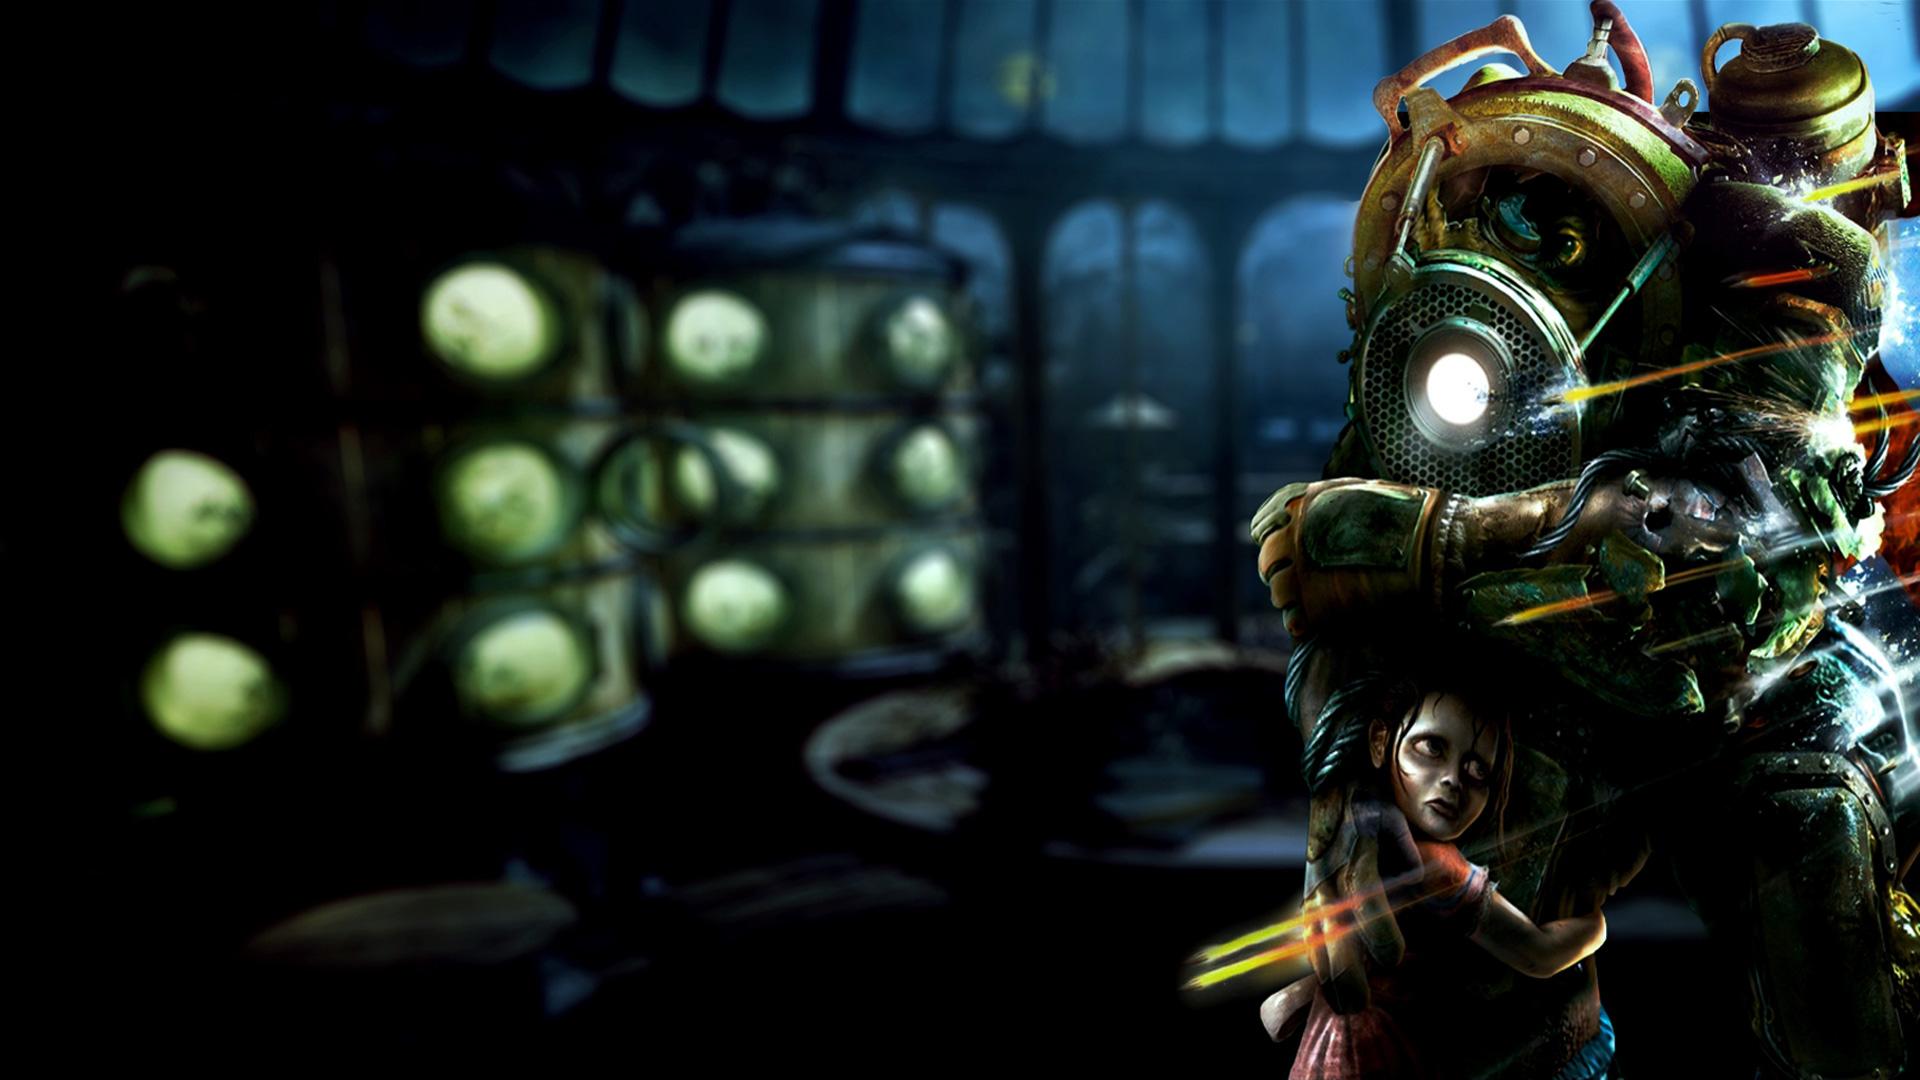 Bioshock wallpaper 12 | WallpapersBQ